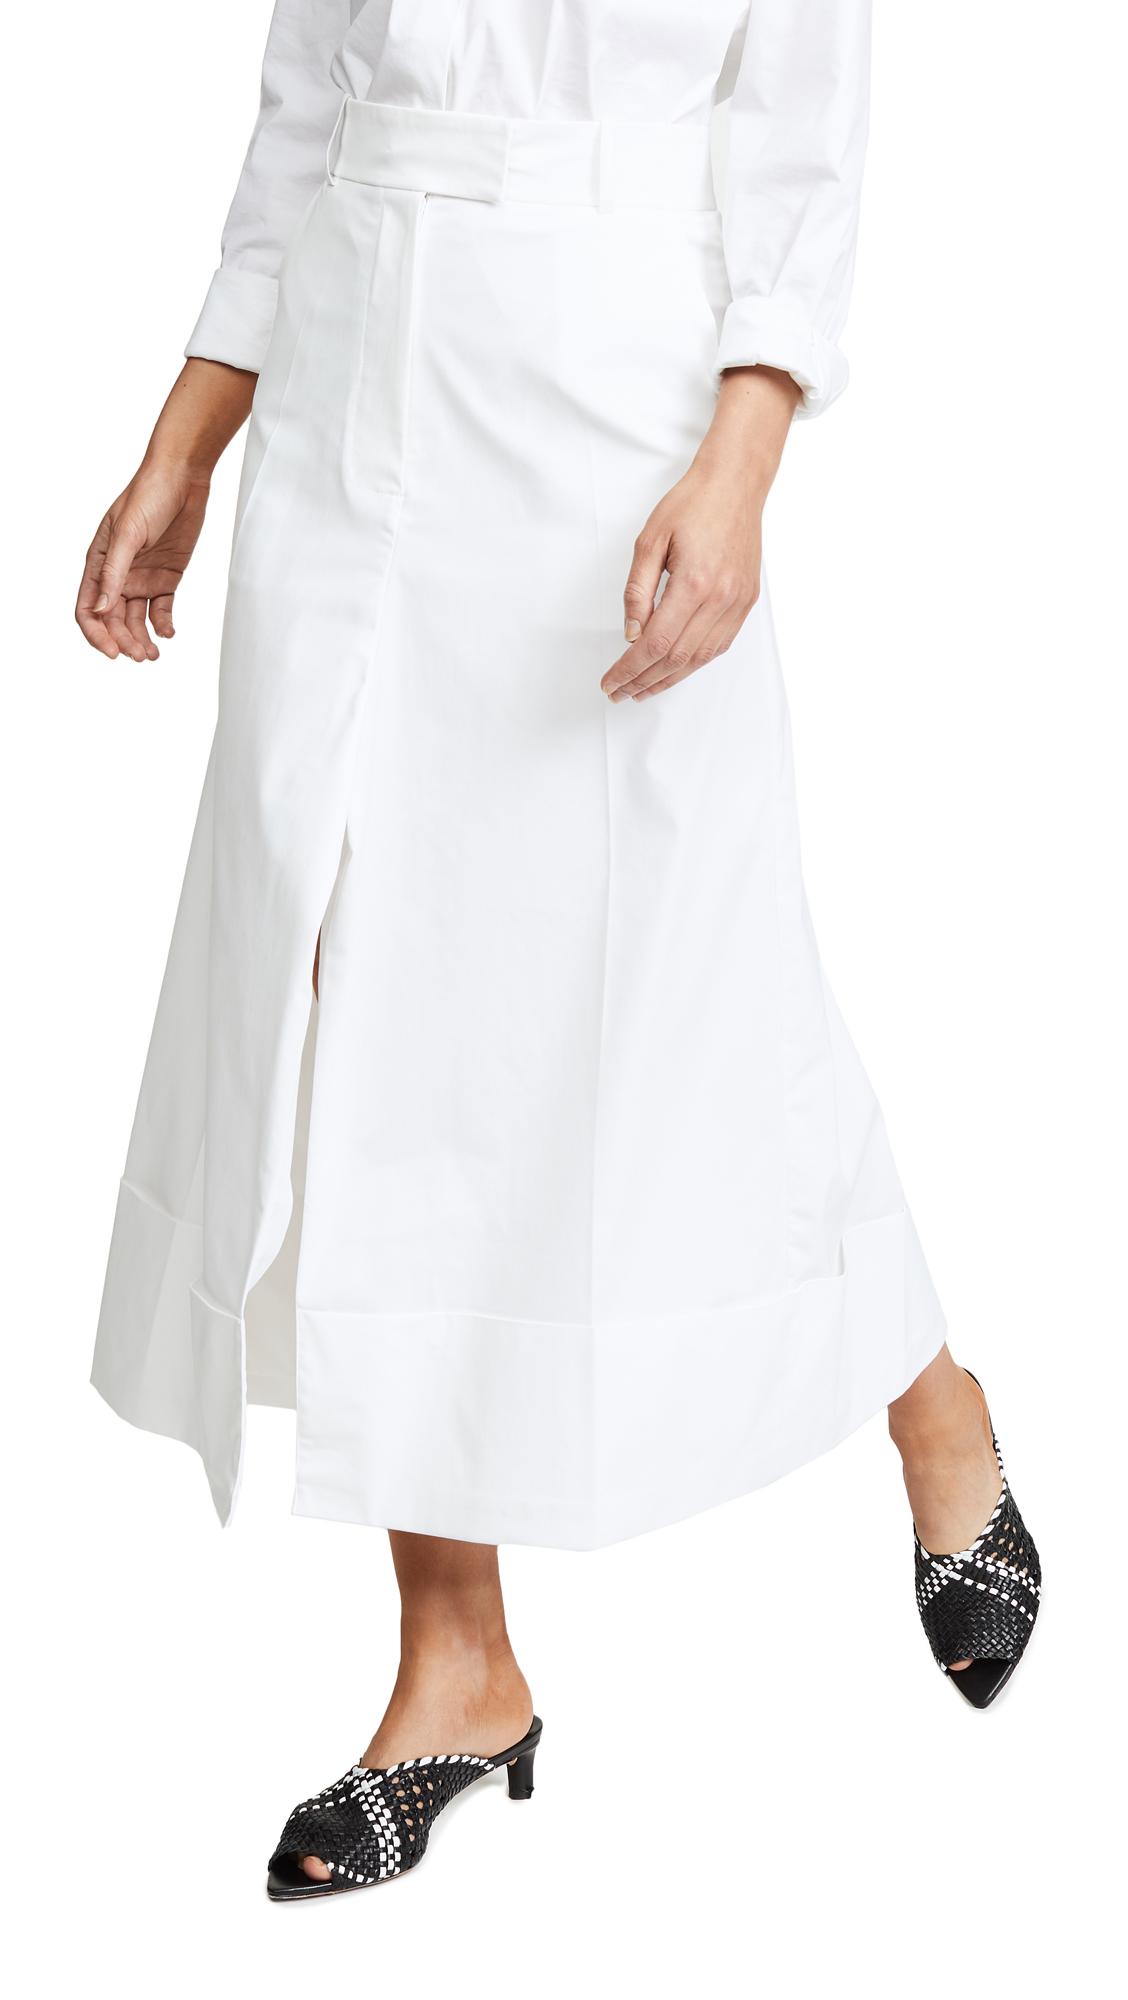 A.W.A.K.E. Pants Skirt In White